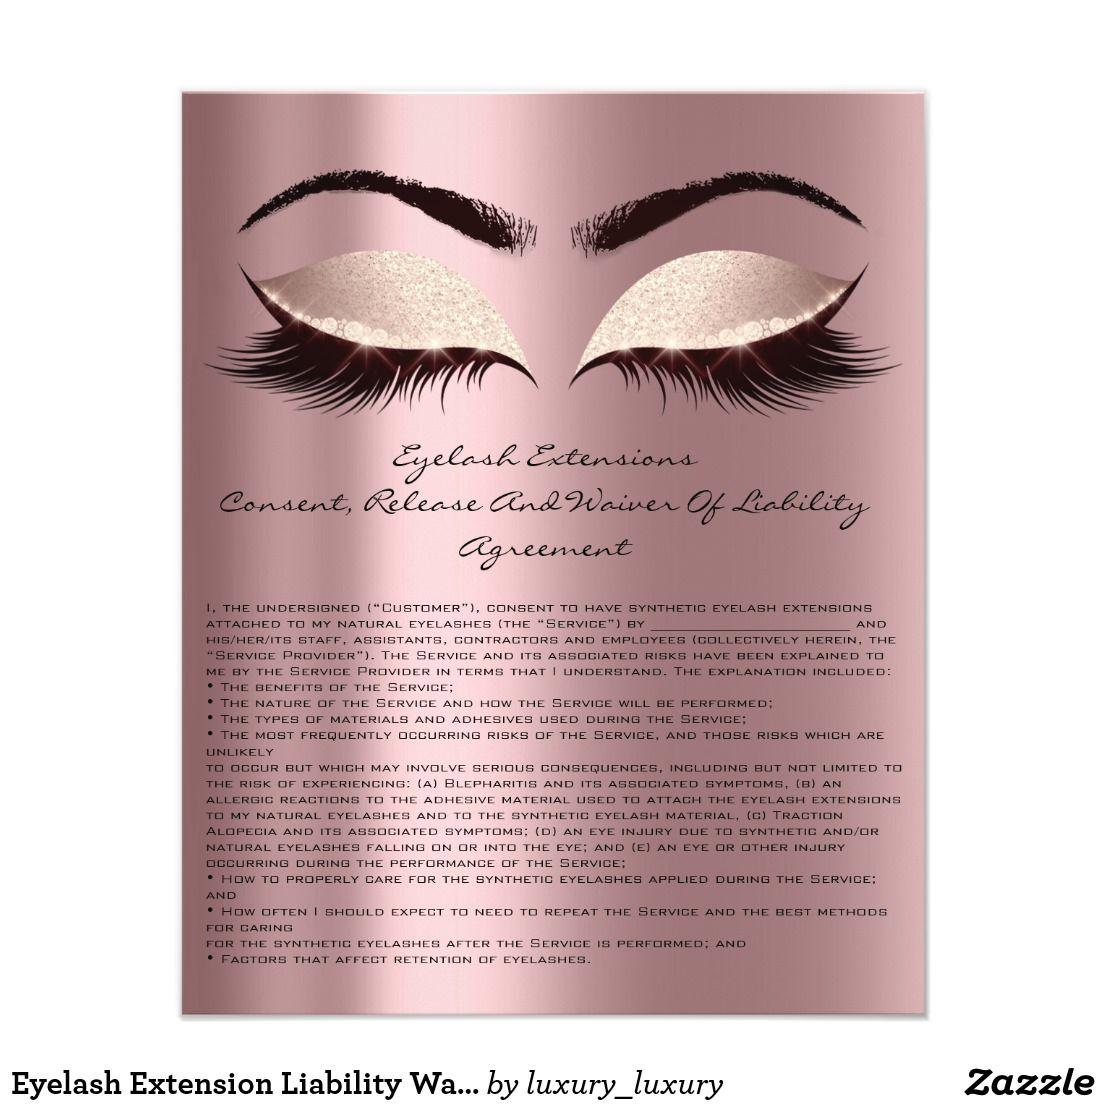 Eyelash Extension Liability Waiver Eyes Rose Spark Flyer